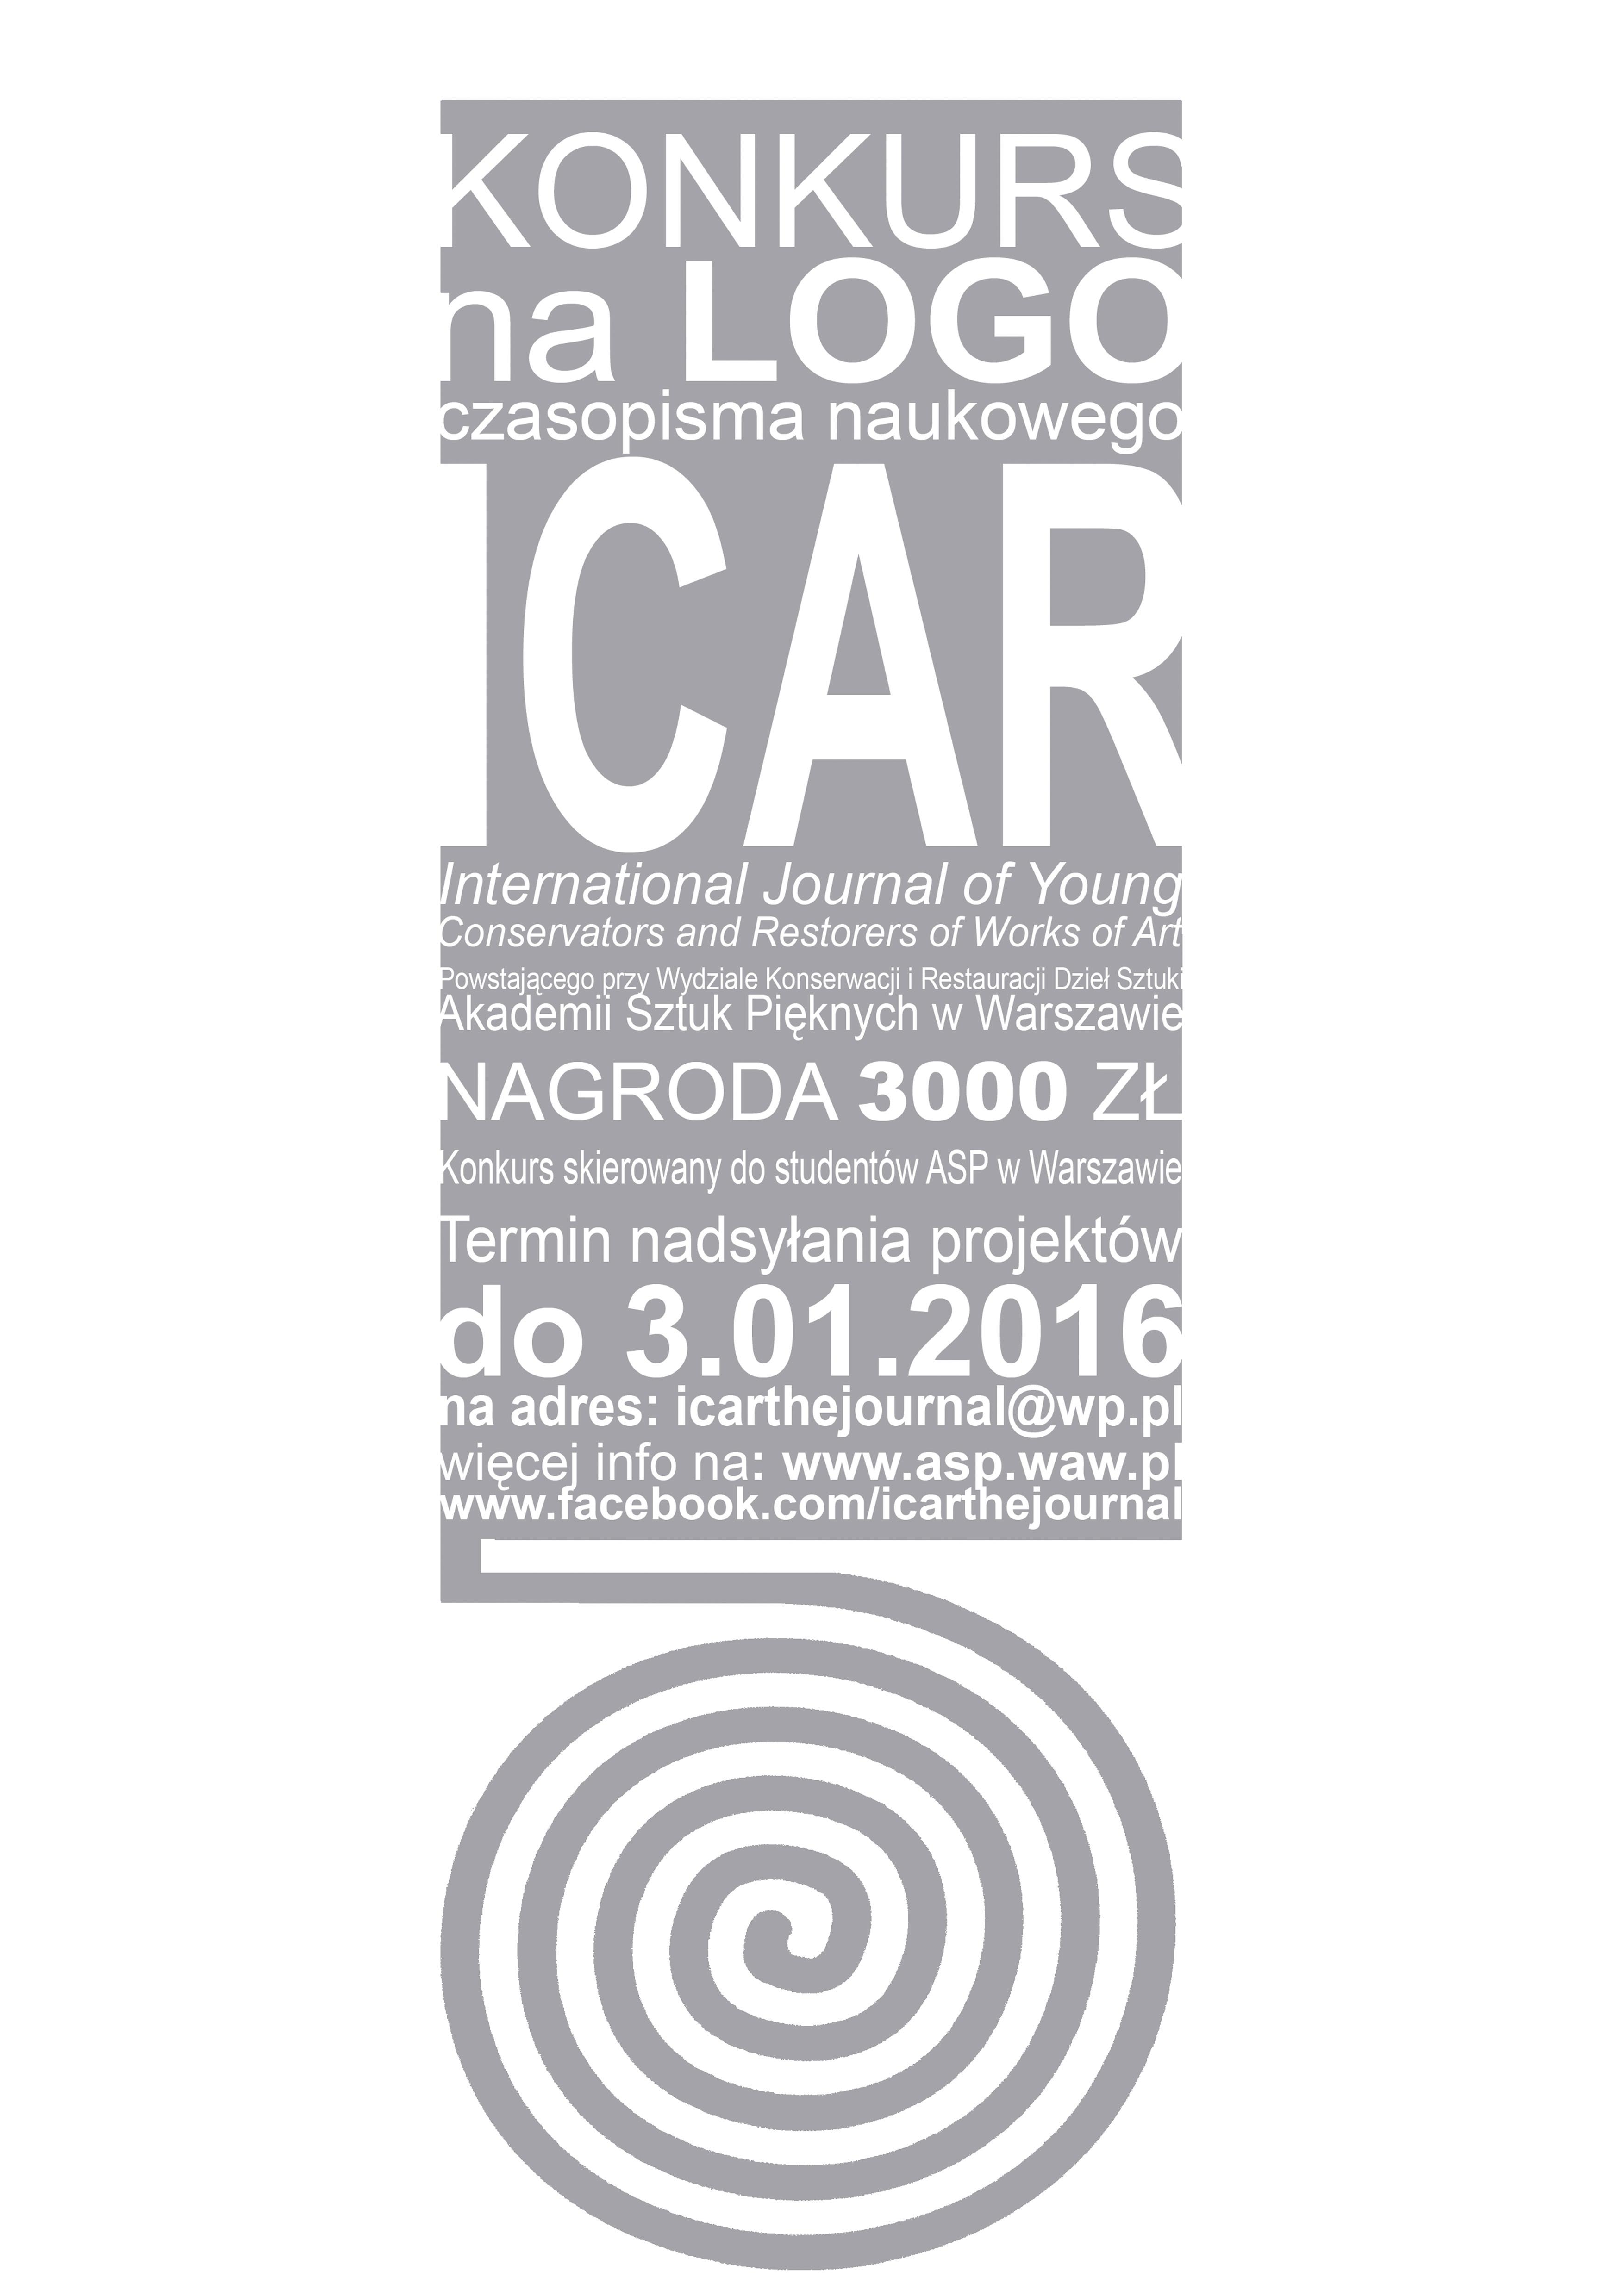 Czasopismo ICAR - plakat konkurs na logotyp